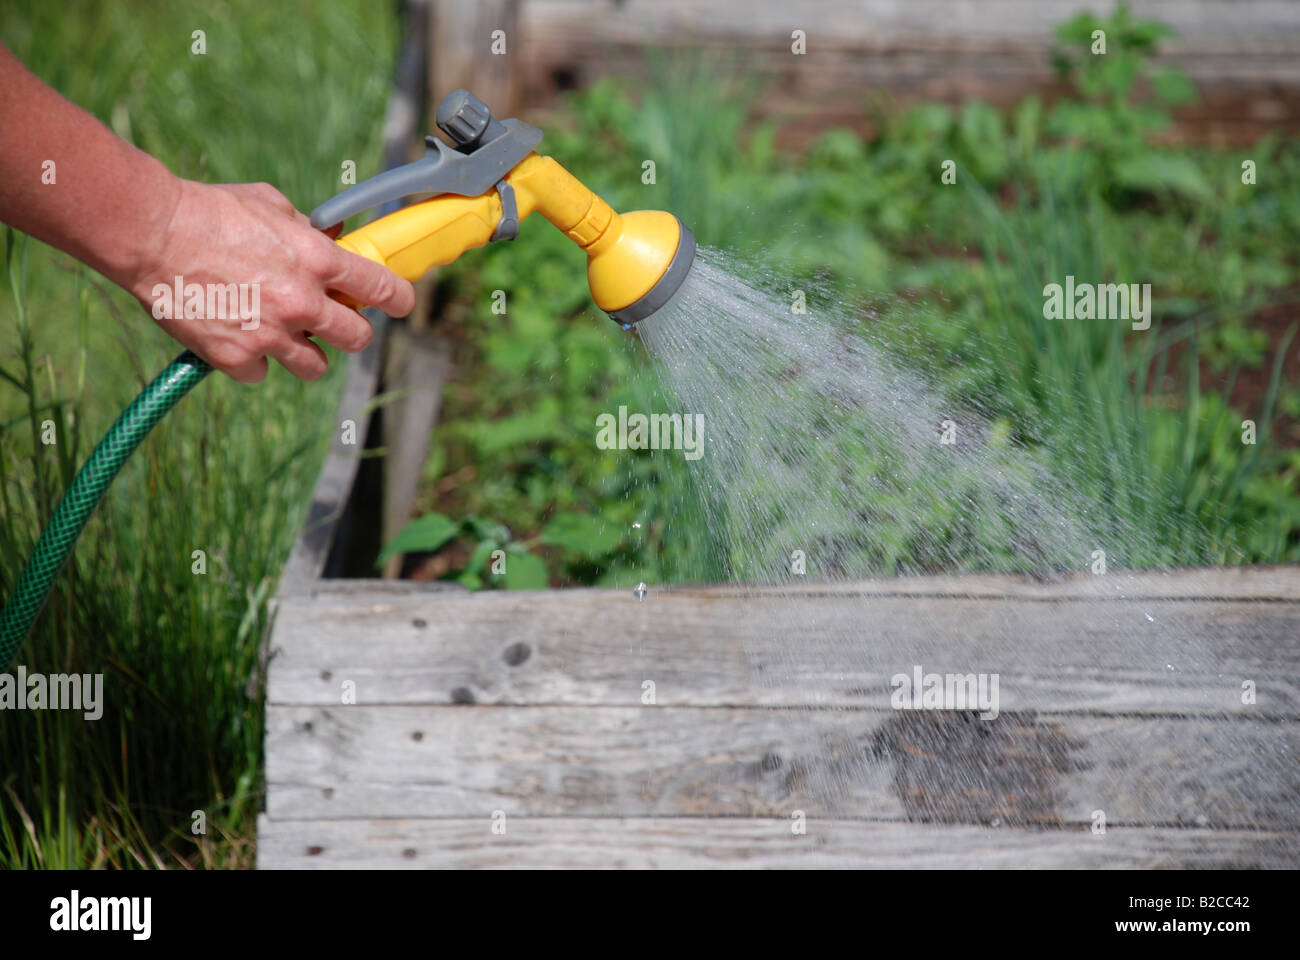 Sprinkle plants - Stock Image